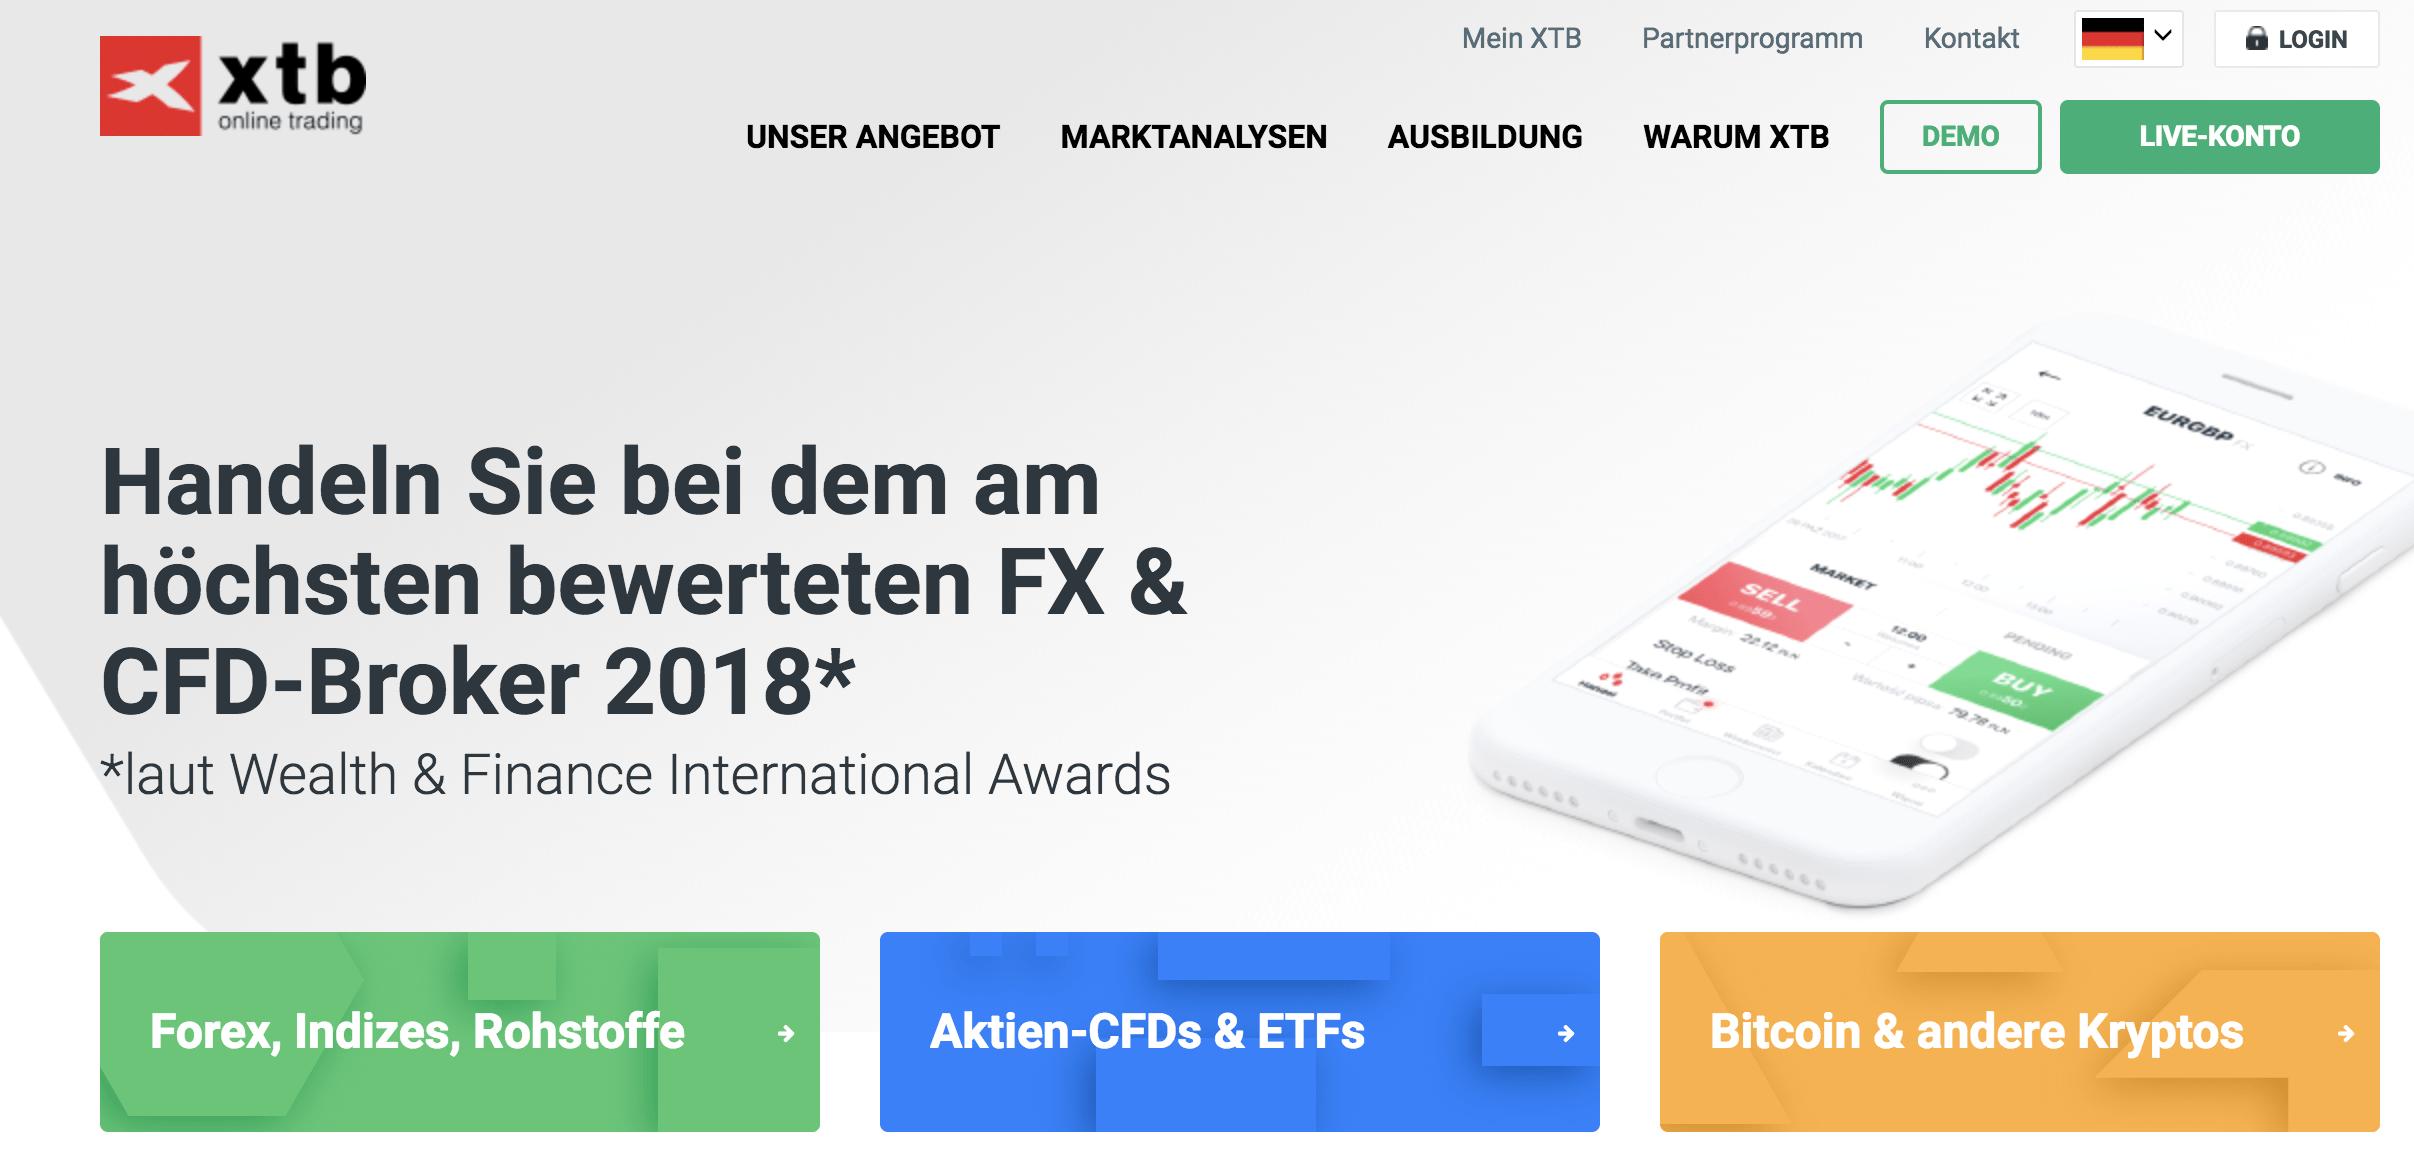 XTB Forex Erfahrungen